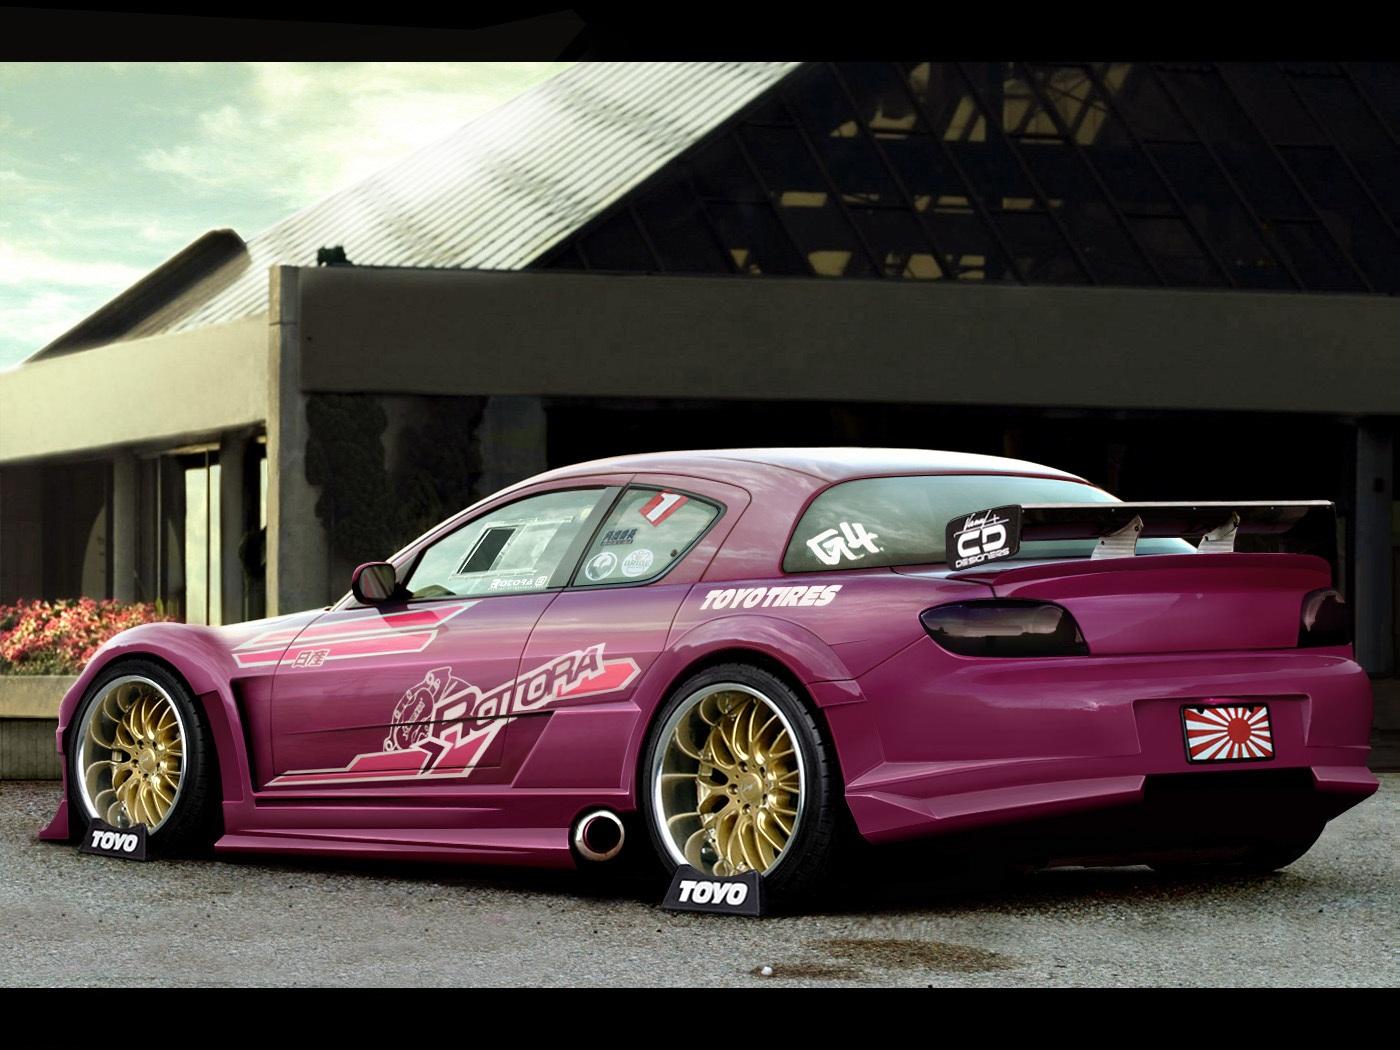 Mazda Rx8 Hd Wallpaper 2013 My Site